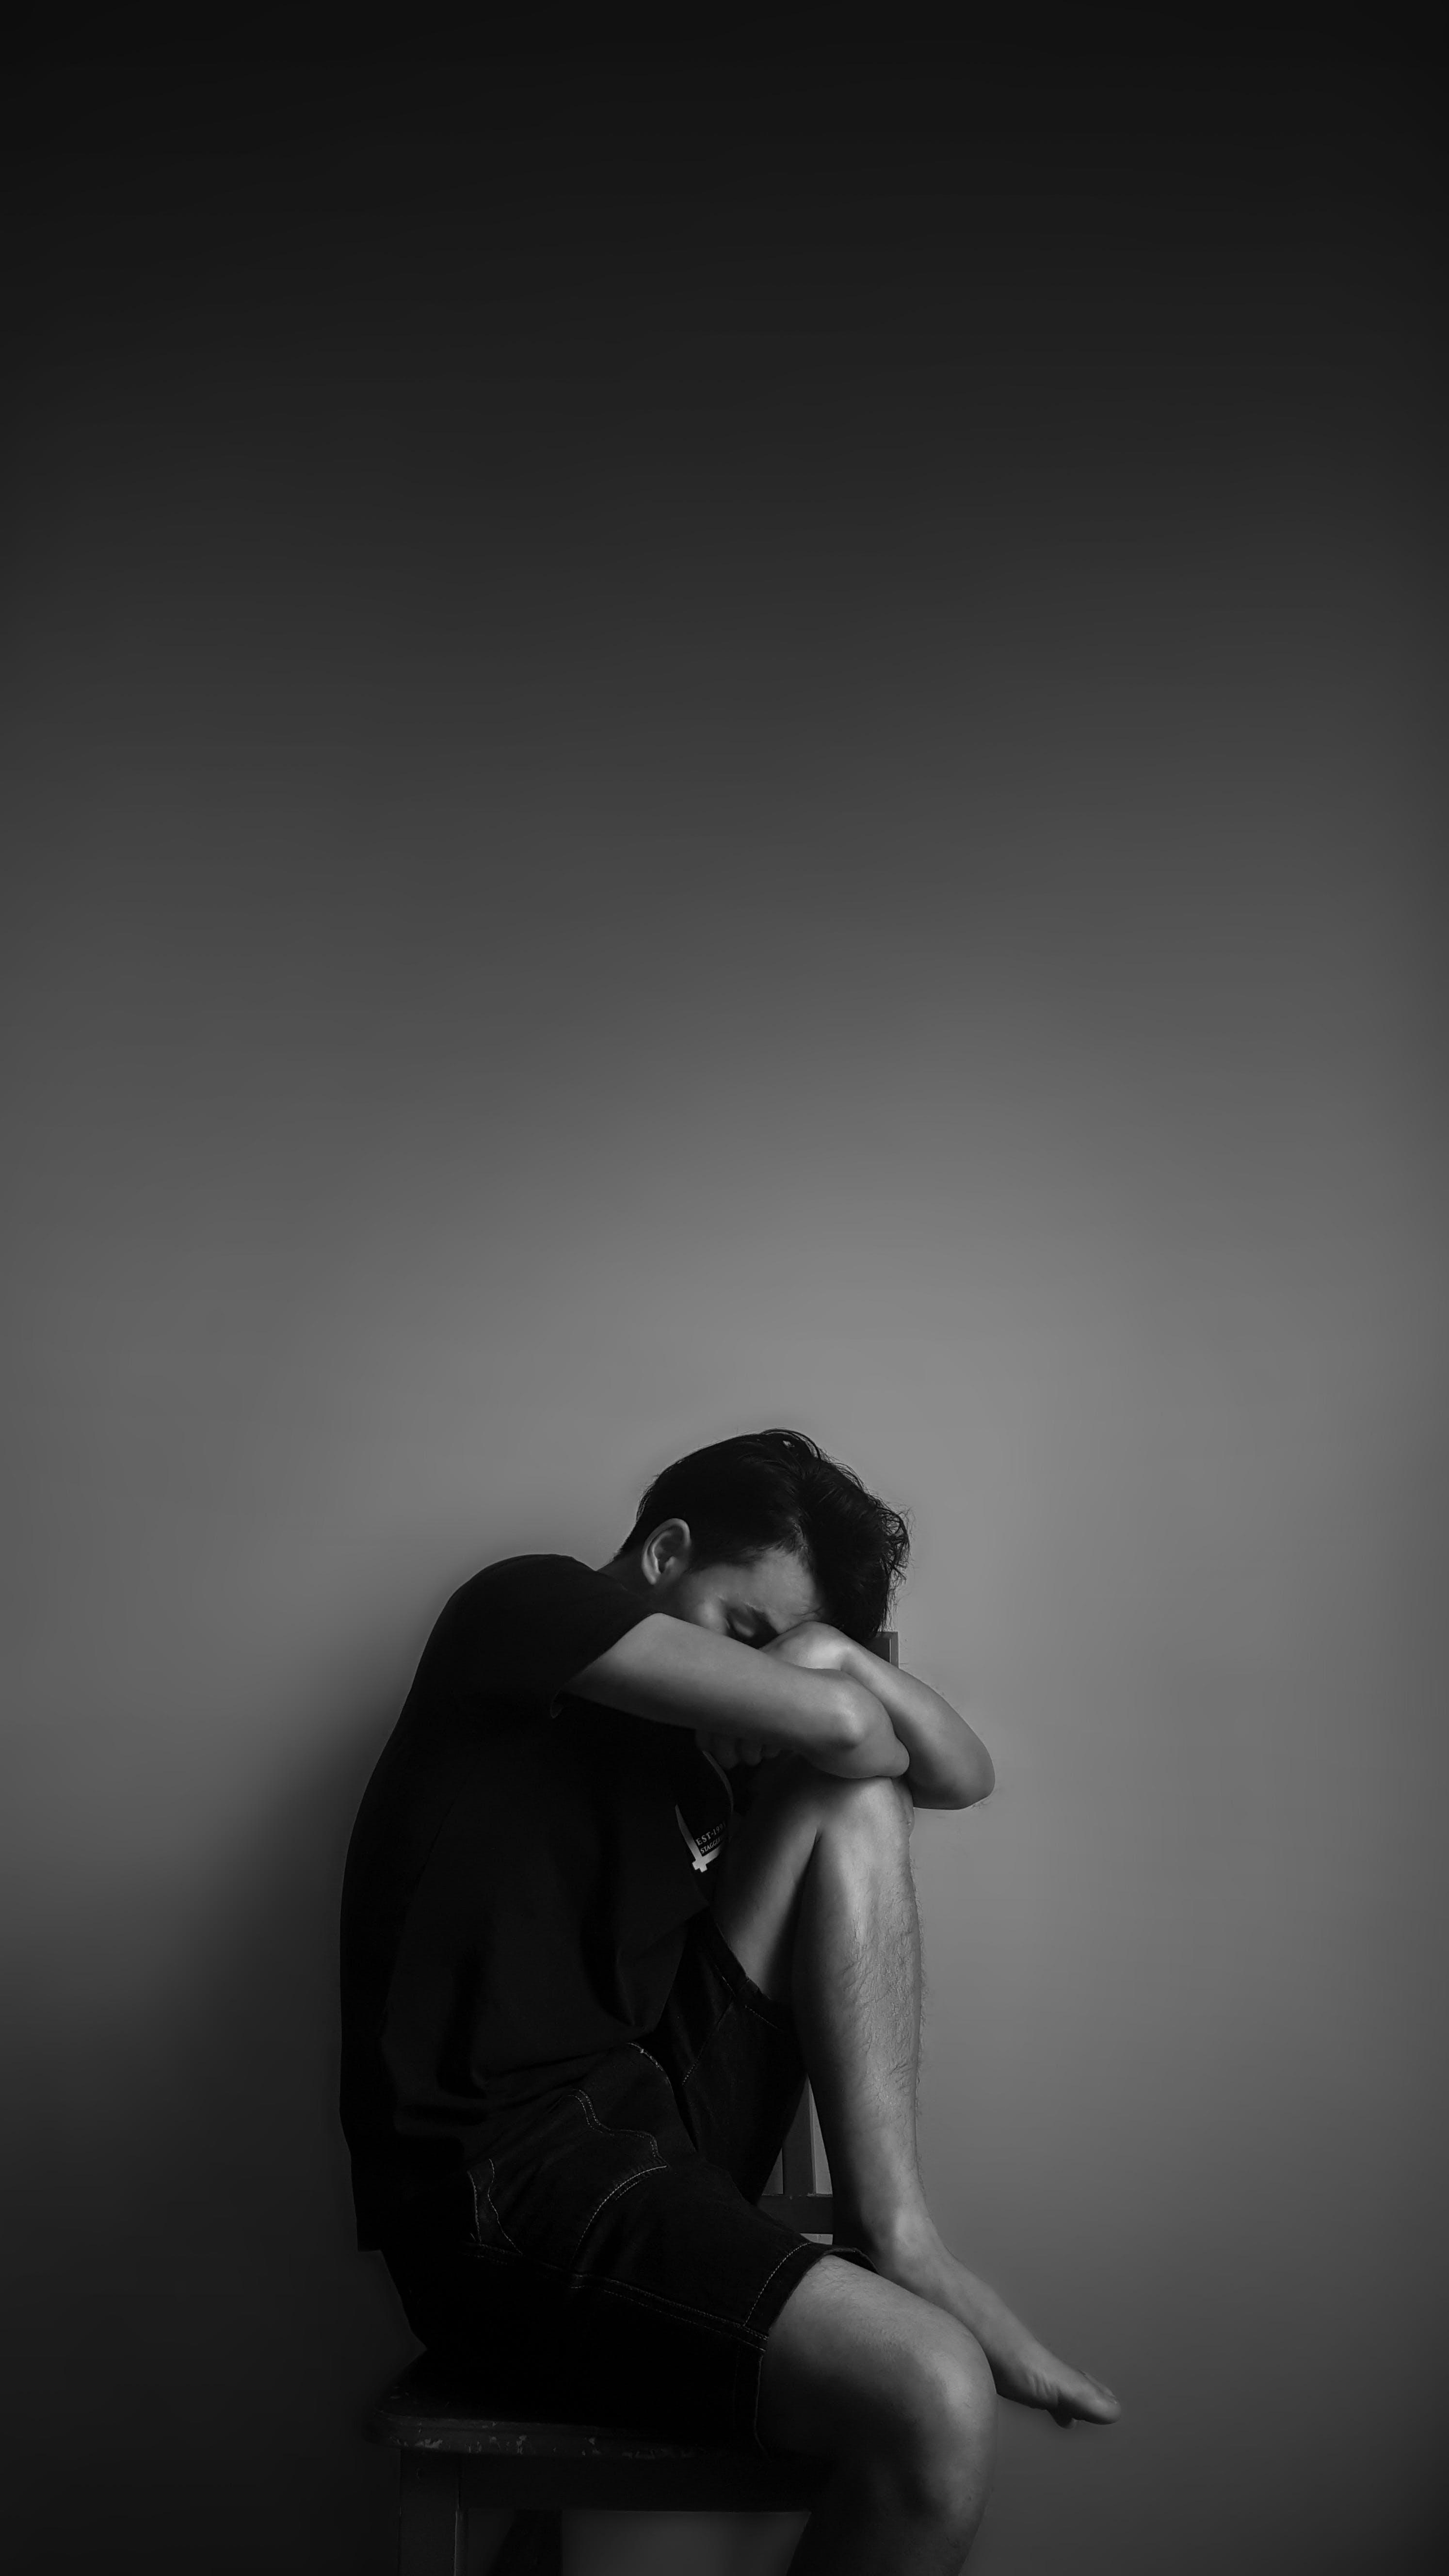 betrübt, depression, dunkel